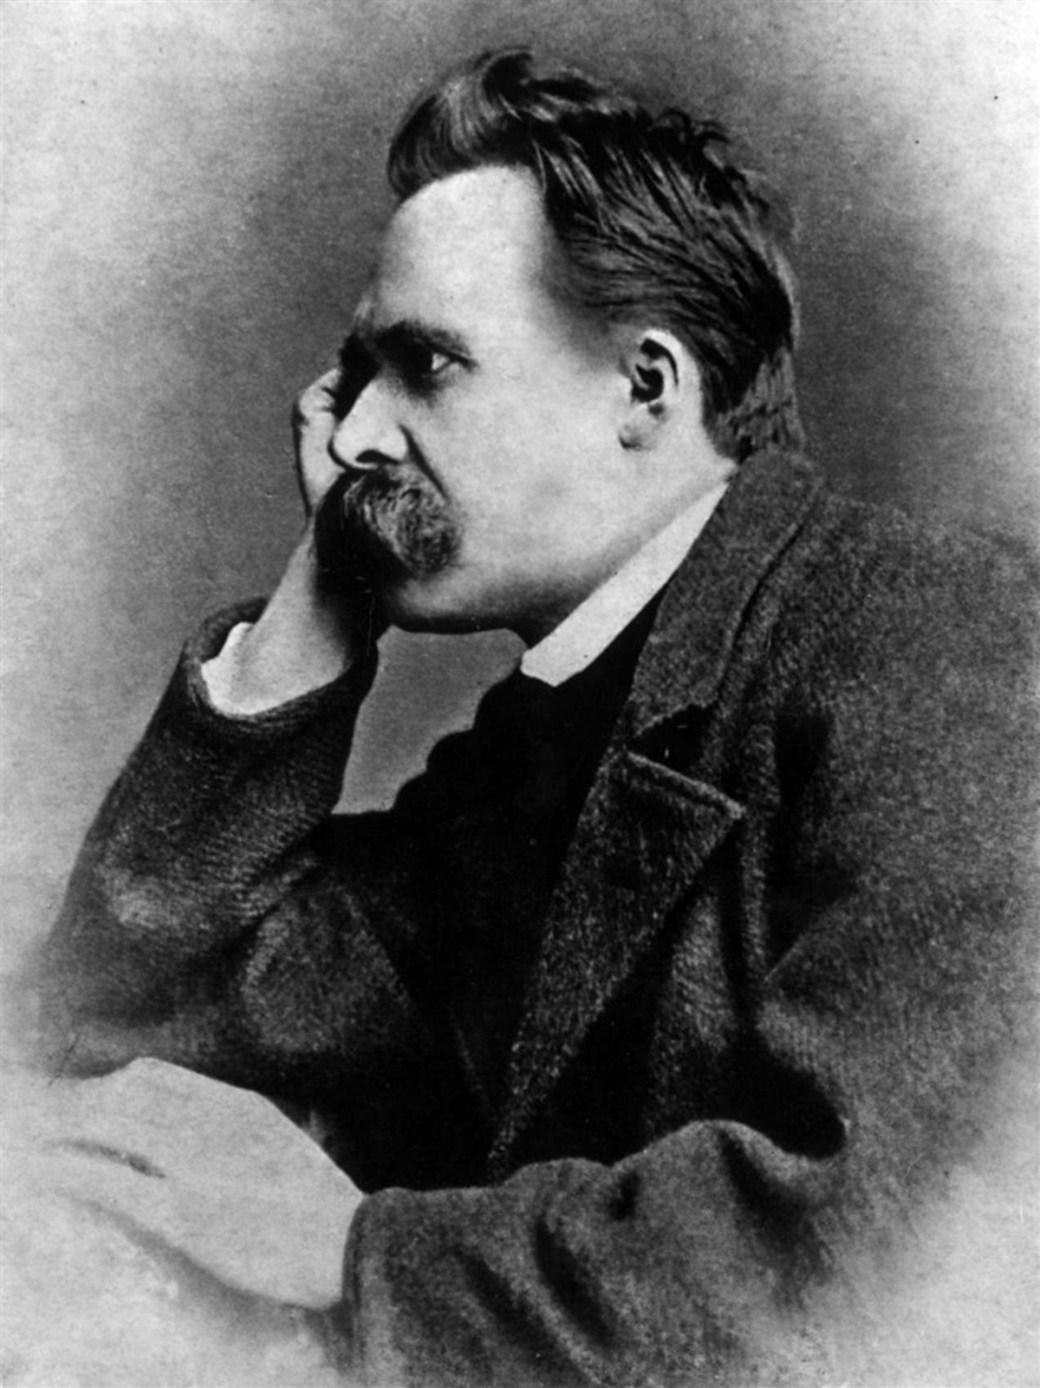 Friedrich Nietzsche en 1882 (Foto de Gustav Schultze)